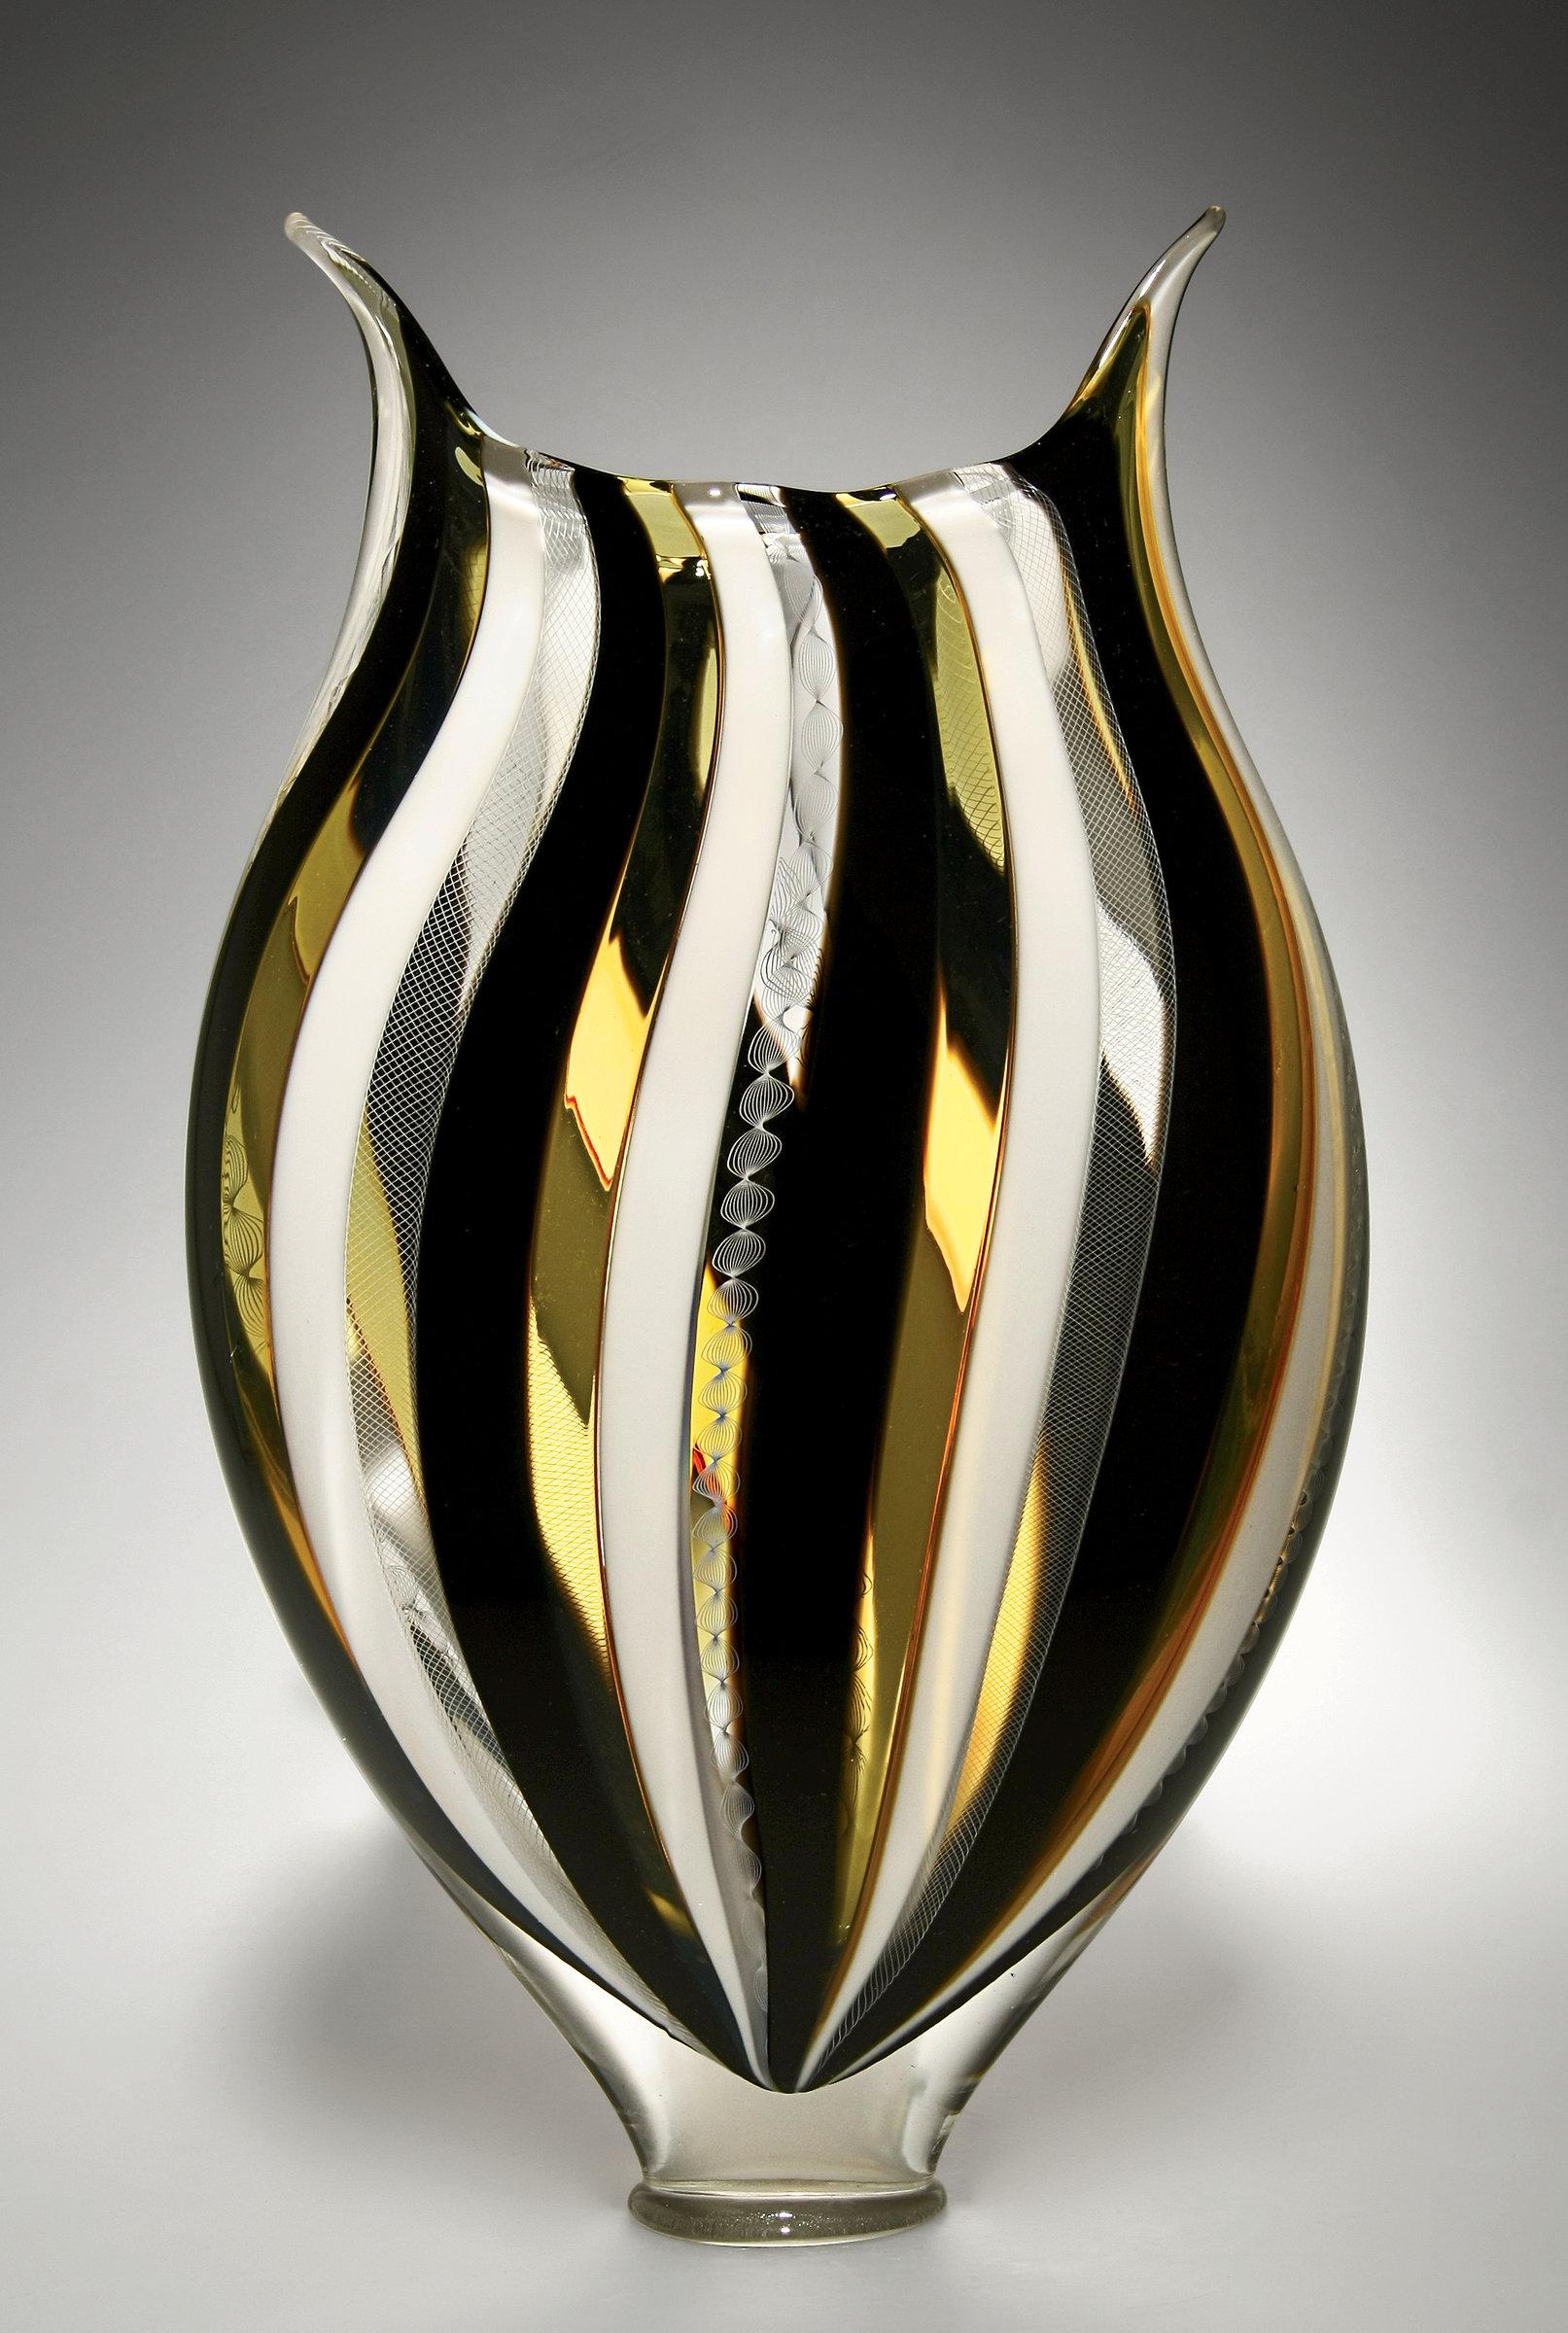 Large Glass Vessel : ... and White Foglio by David Patchen (Art Glass Vessel) Artful Home